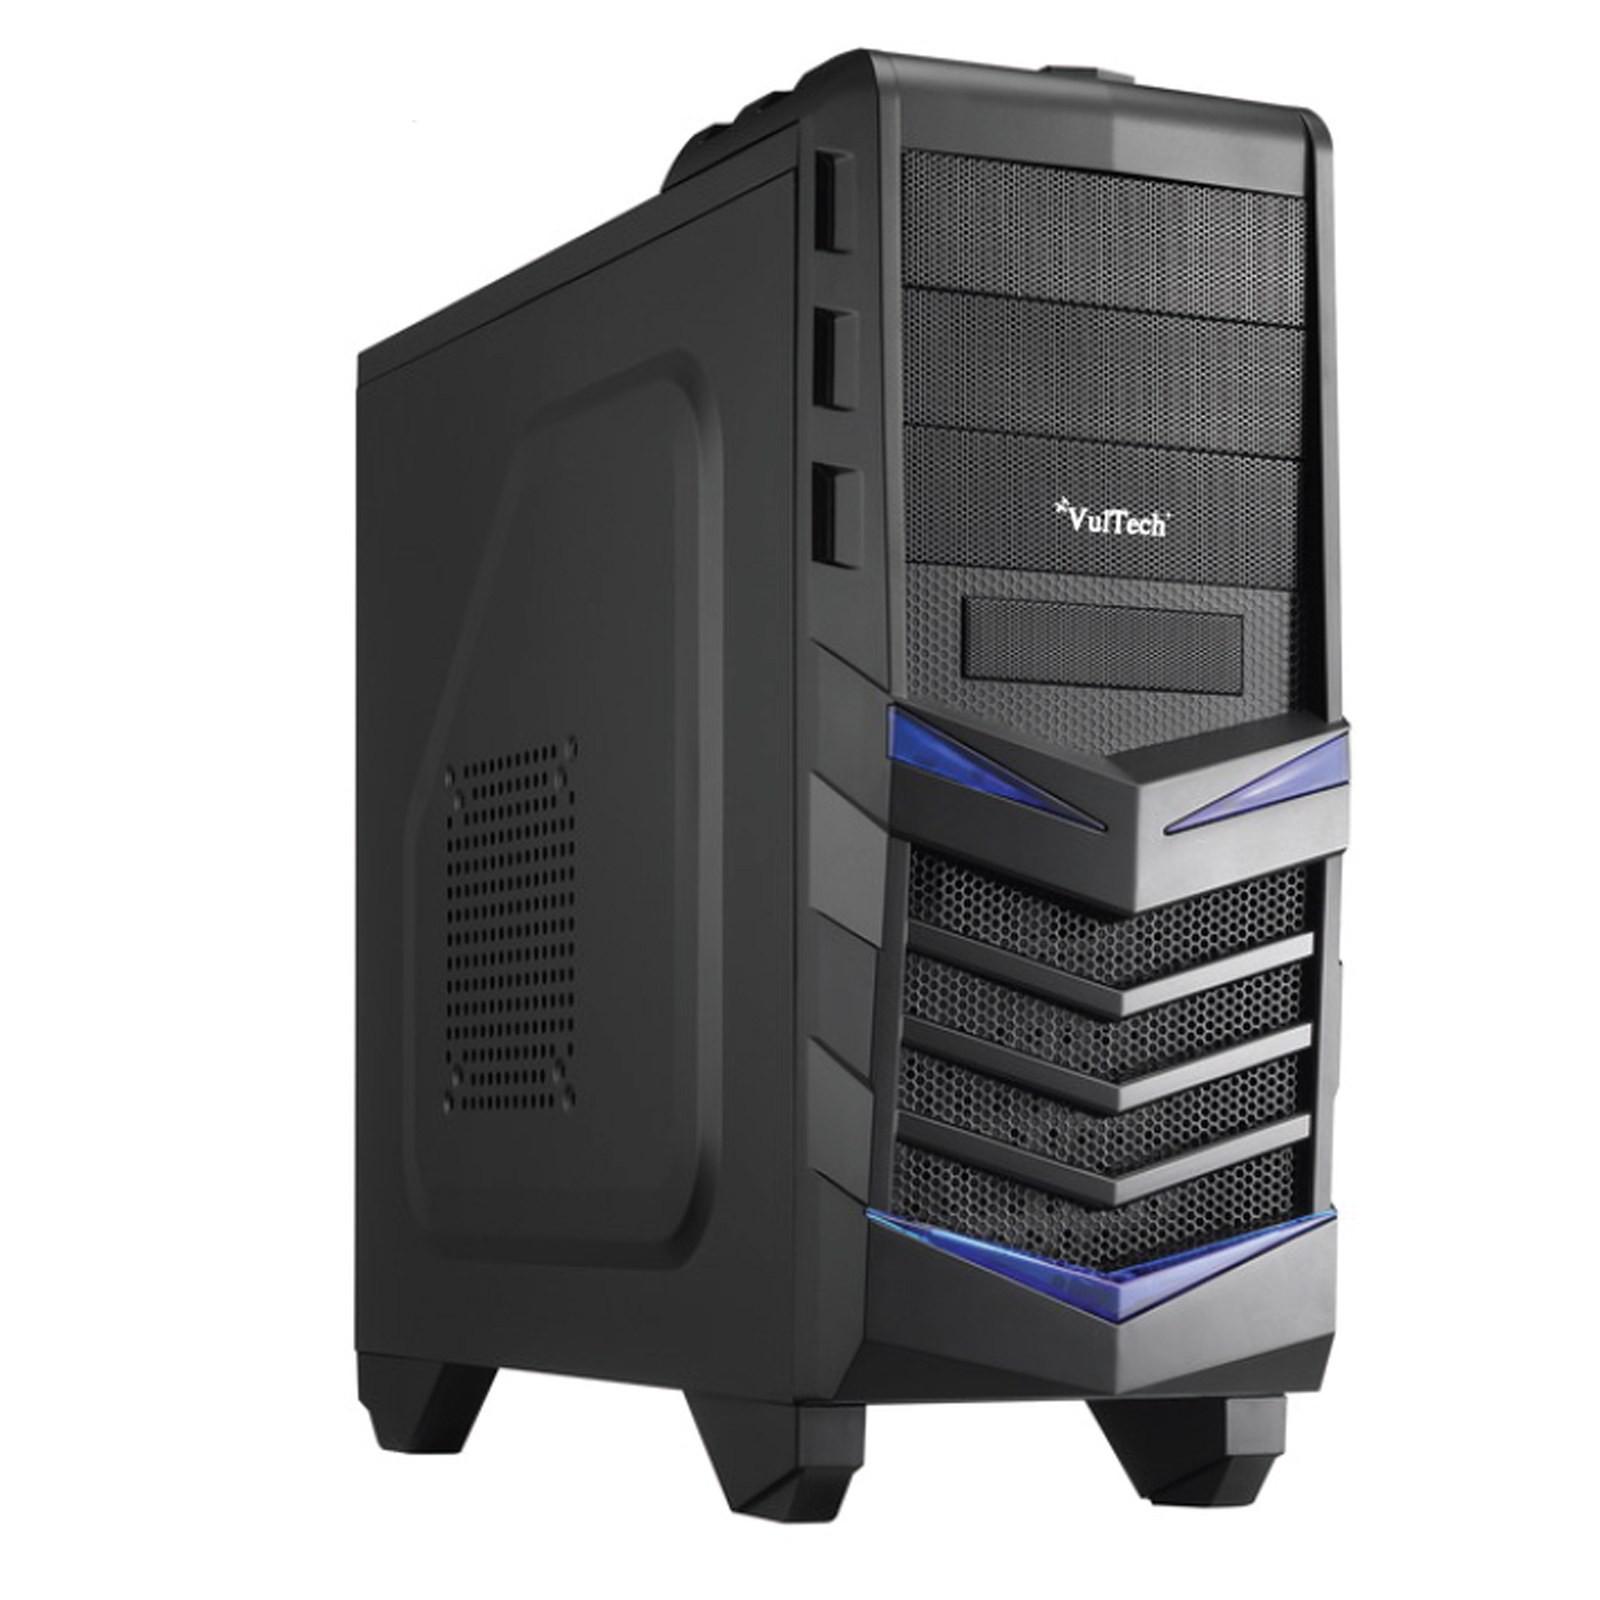 CASE CABINET PER PC DESKTOP GAMING ATX VULTECH ATX OBLIVION COMPUTER GS-0787 NEW